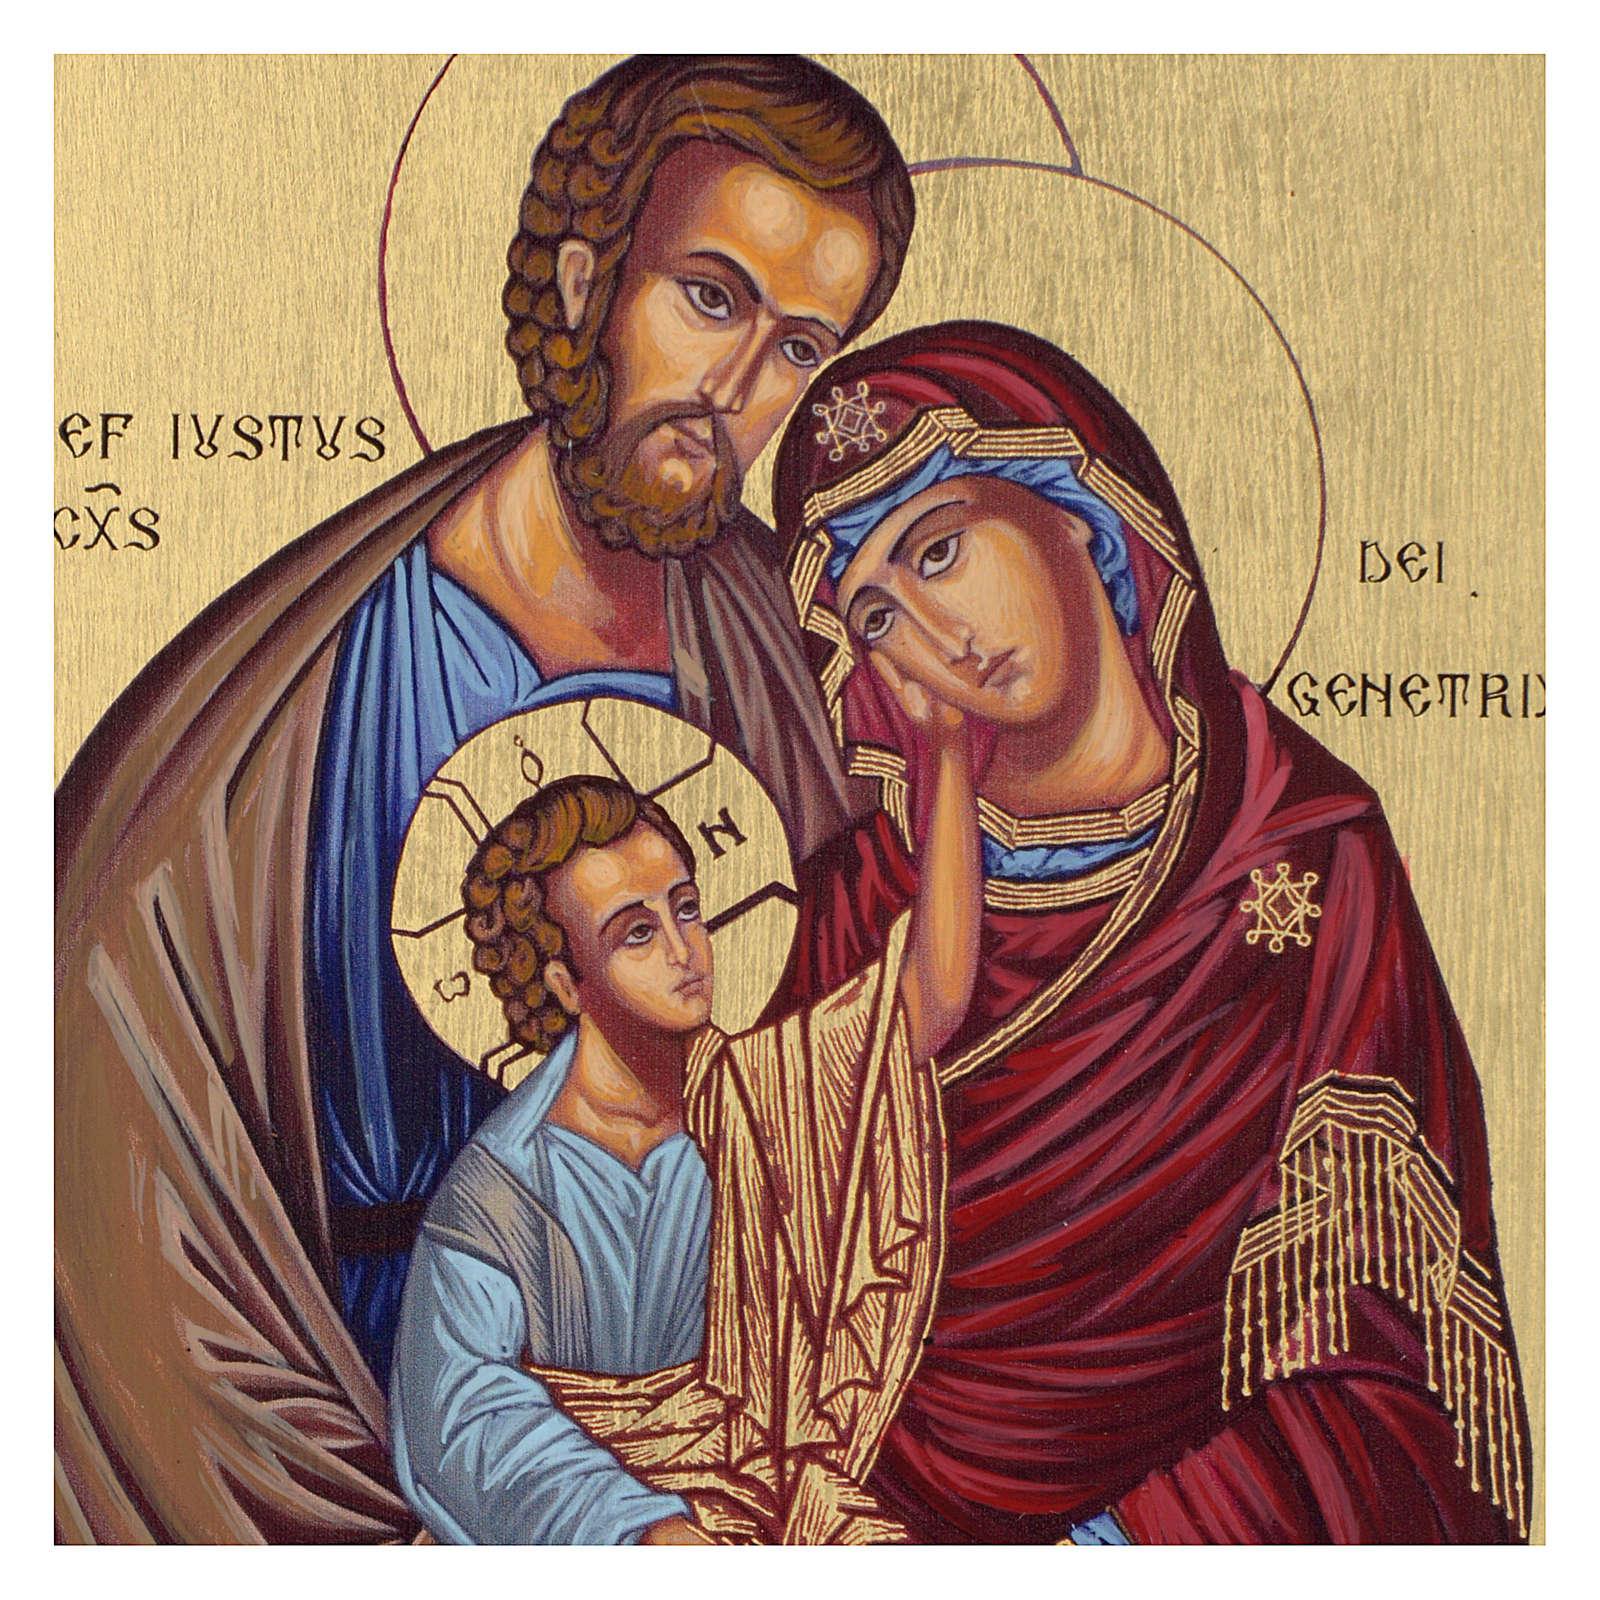 Icona Bizantina Sacra famiglia dipinta su legno 18x14 cm 4